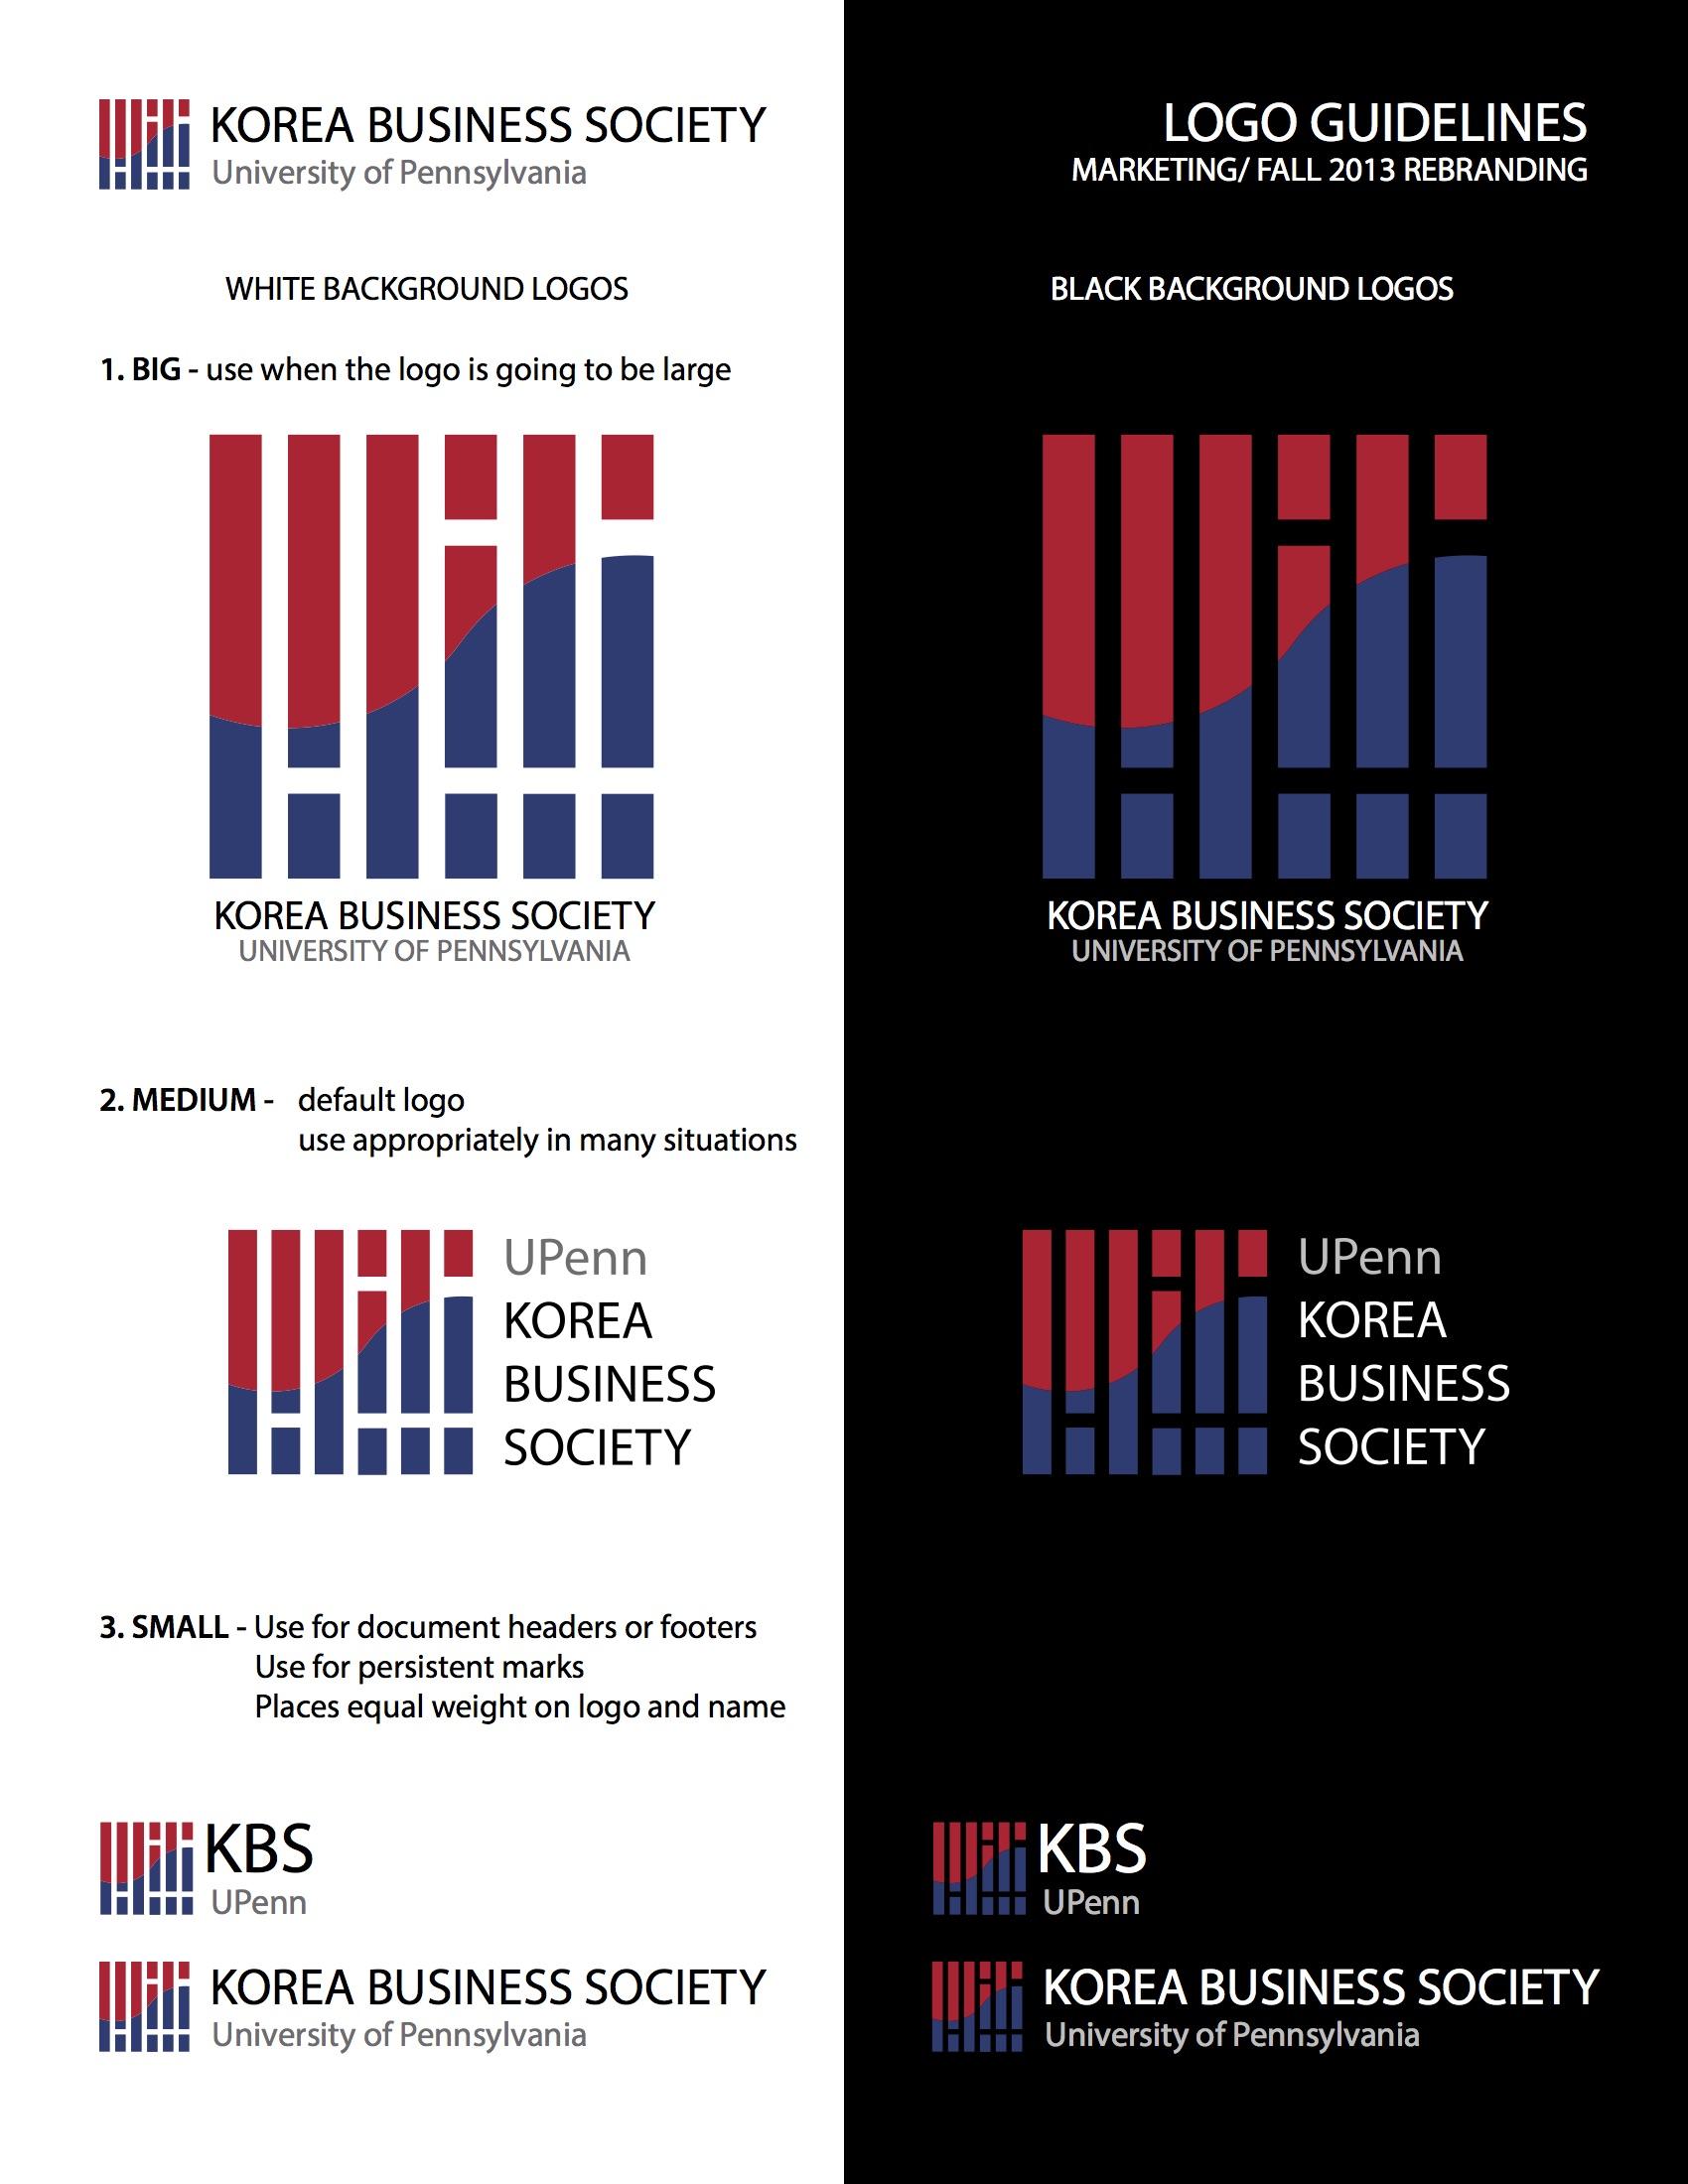 - Wharton KUBS IdentityRebranding of Wharton Korea Undergraduate Business Society (Wharton KUBS), formerly Korea Business Society (KBS). Using motifs from the Korean flag, this scalable logo unites corporate aesthetic with distinctly Korean and Penn motifs.